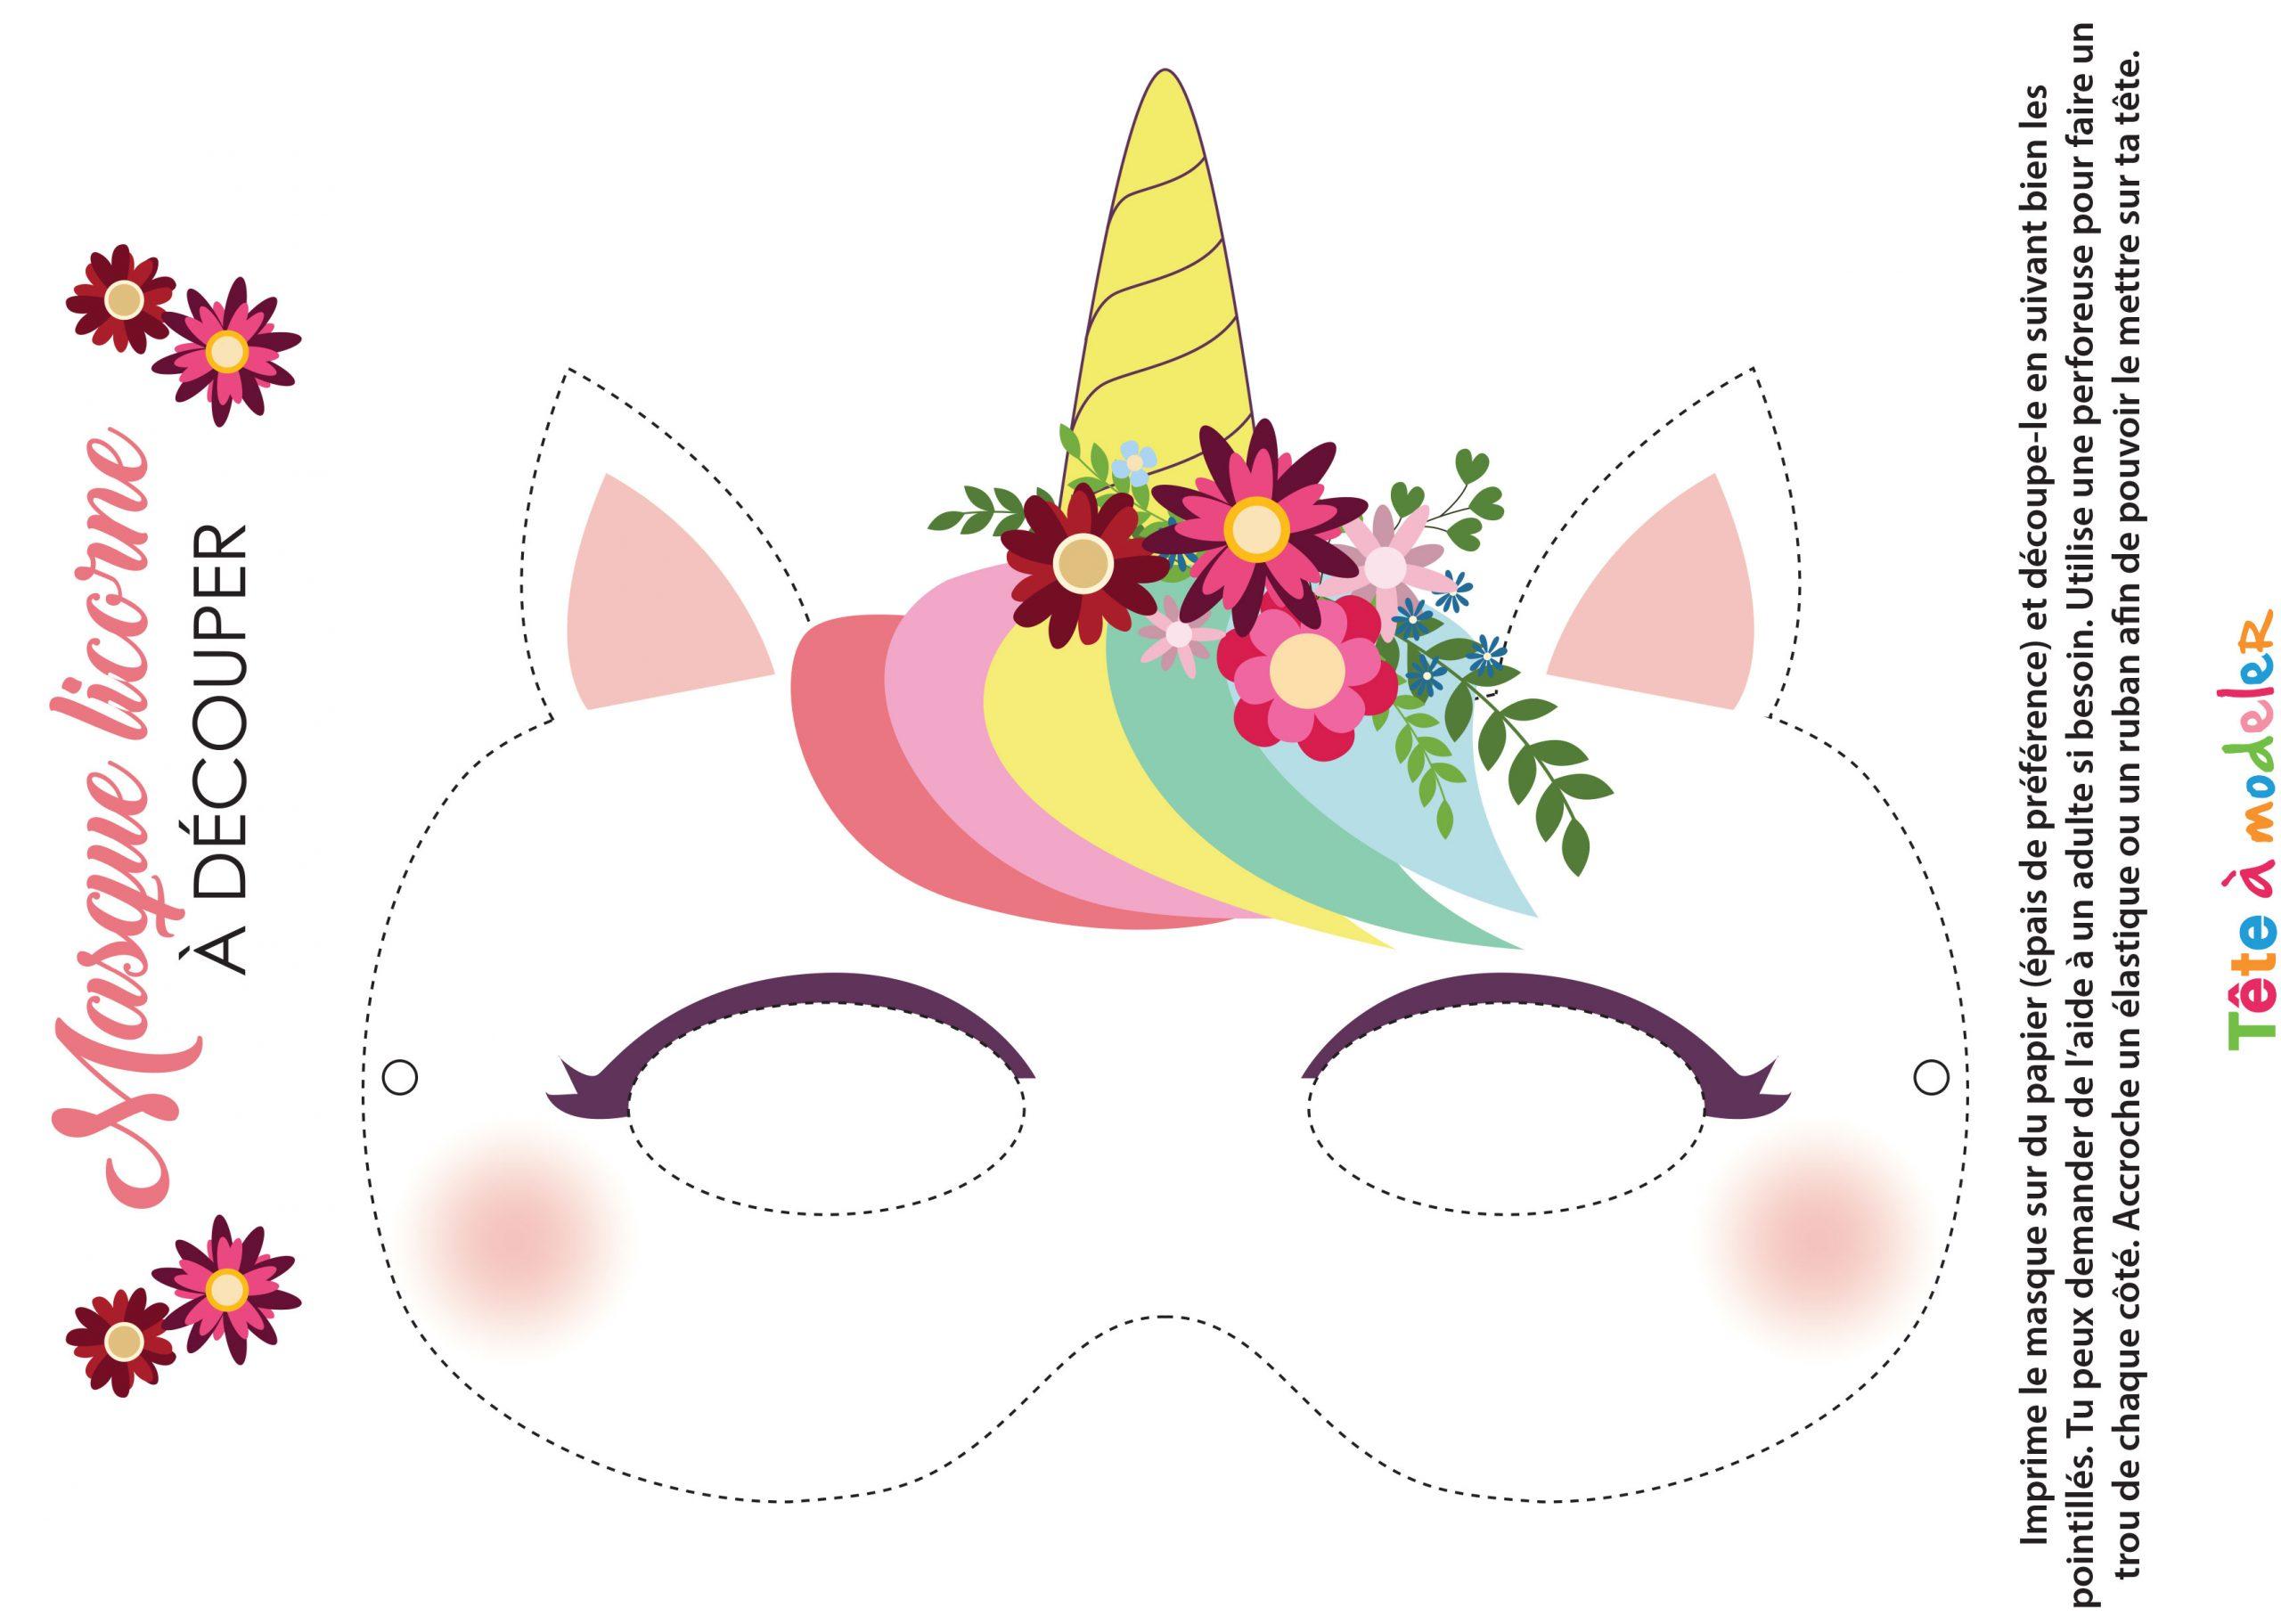 Masque De Licorne À Imprimer Avec Tête À Modeler encequiconcerne Modele Masque De Carnaval A Imprimer